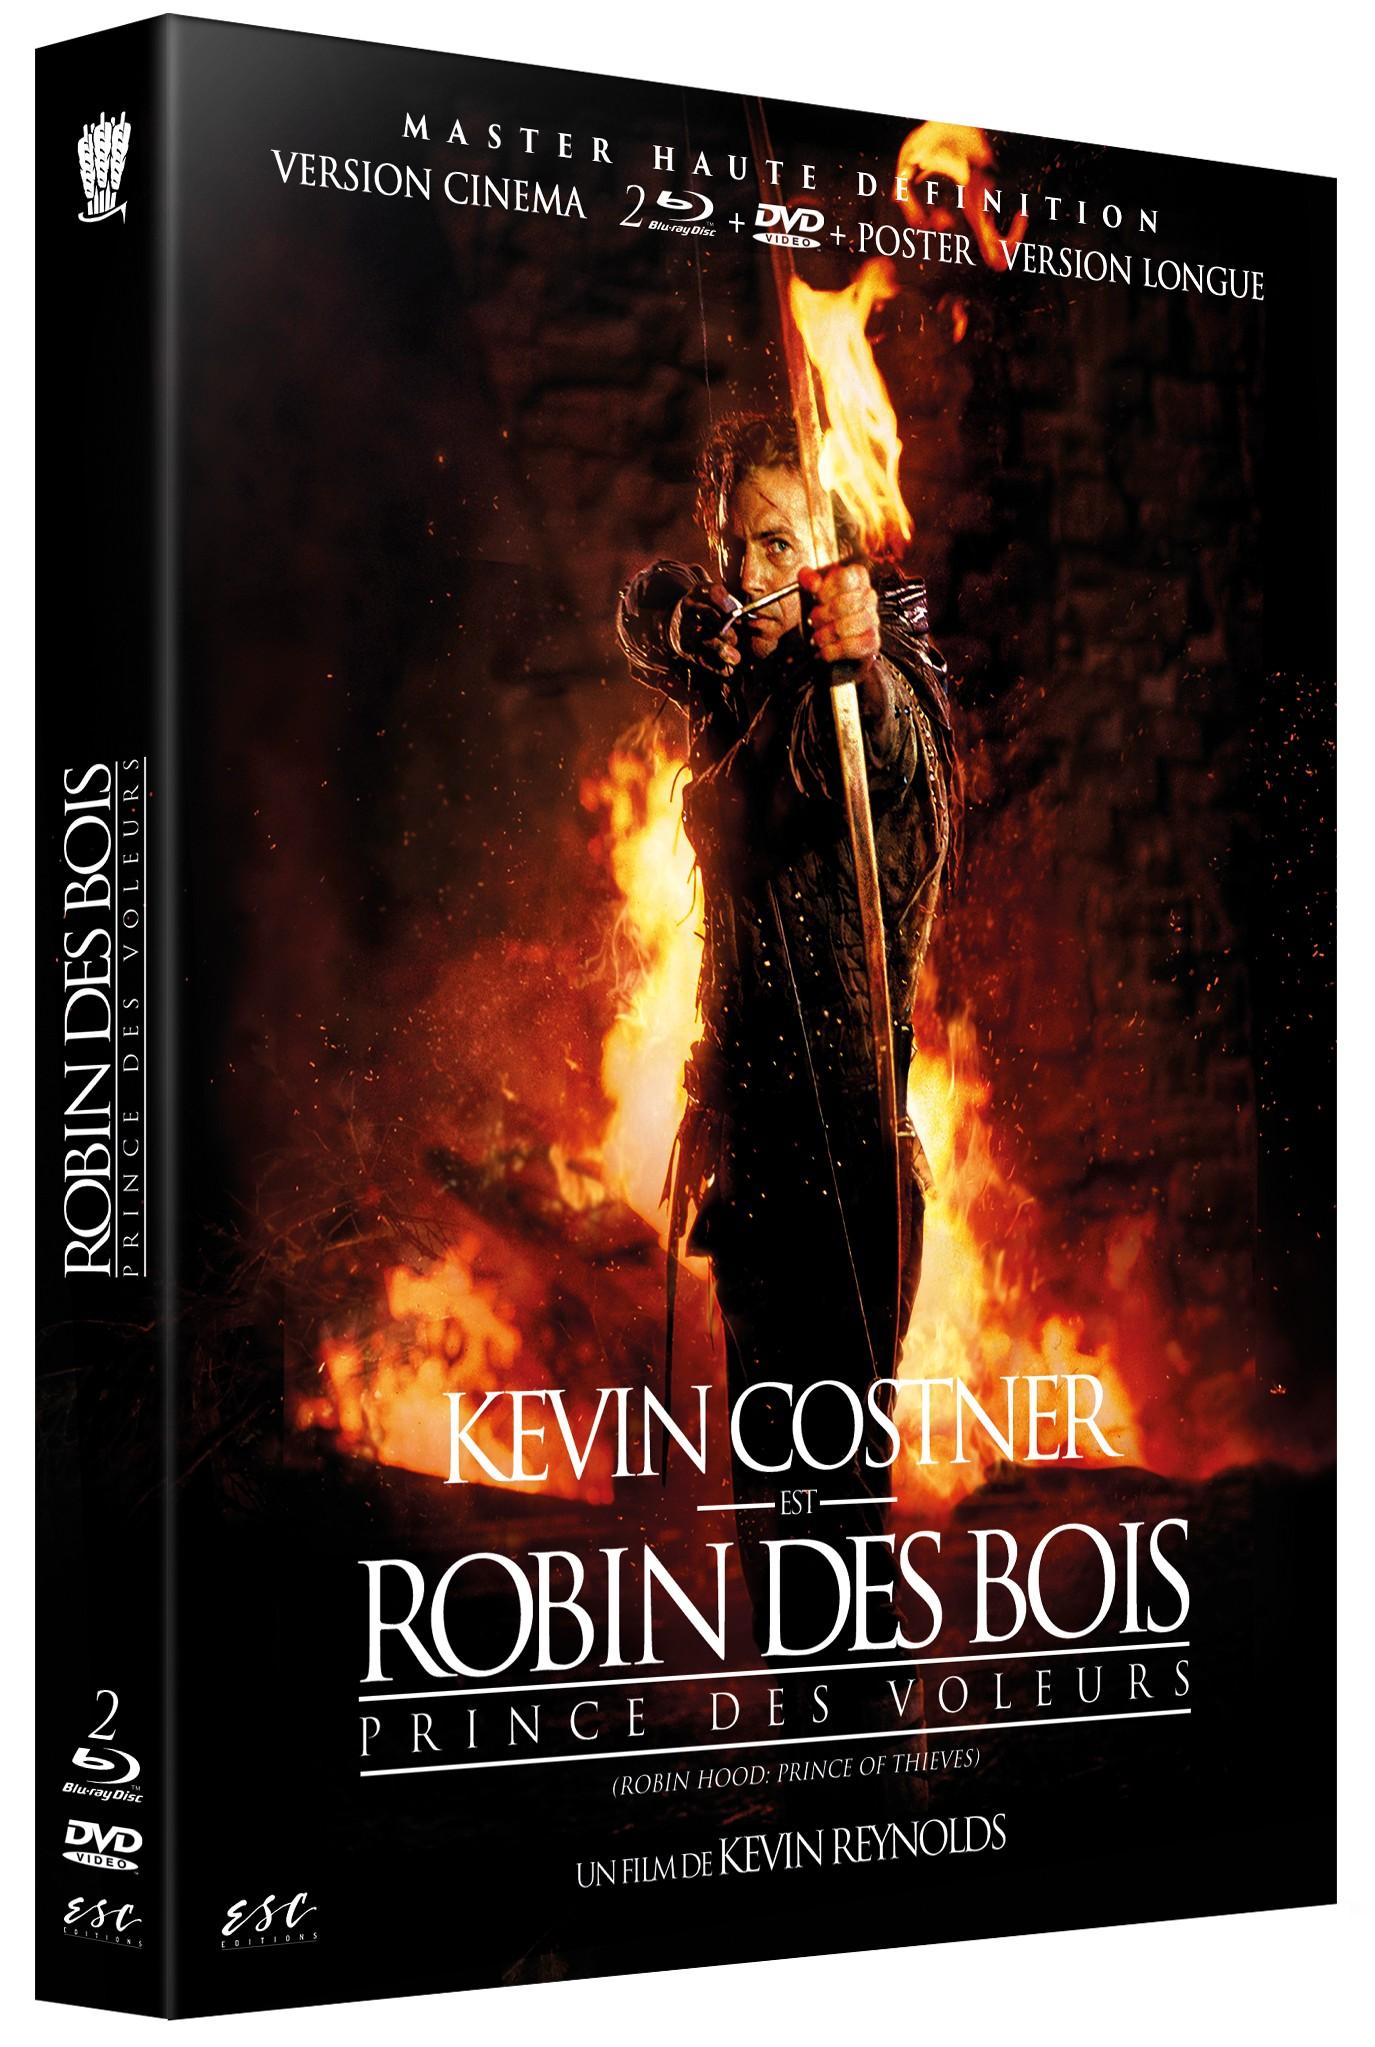 ROBIN DES BOIS, PRINCE DES VOLEURS - BRD